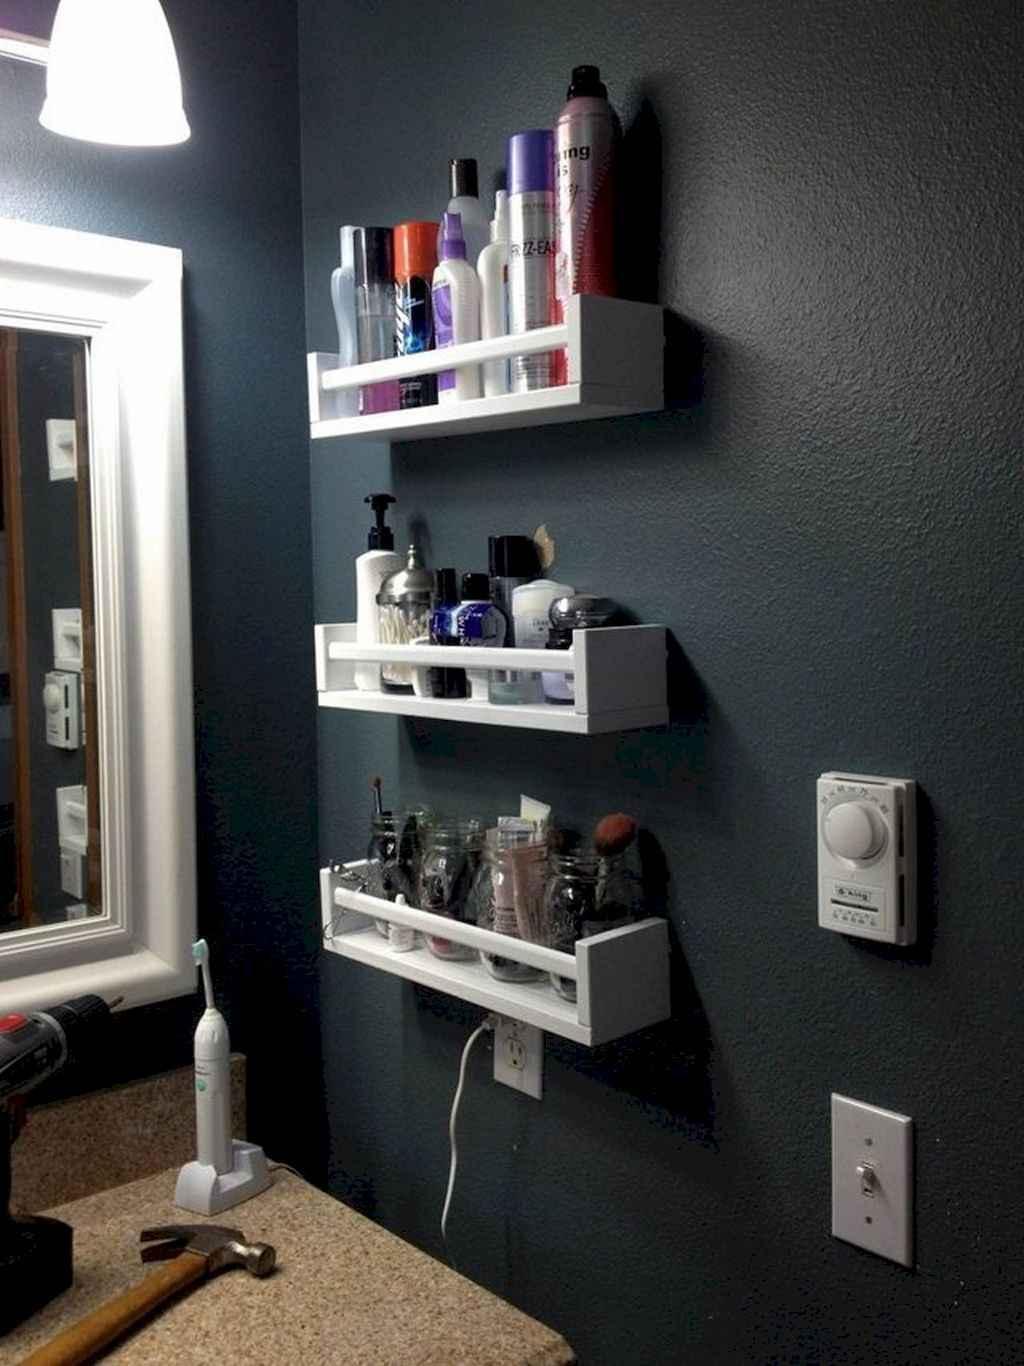 Small apartment decorating ideas (86)